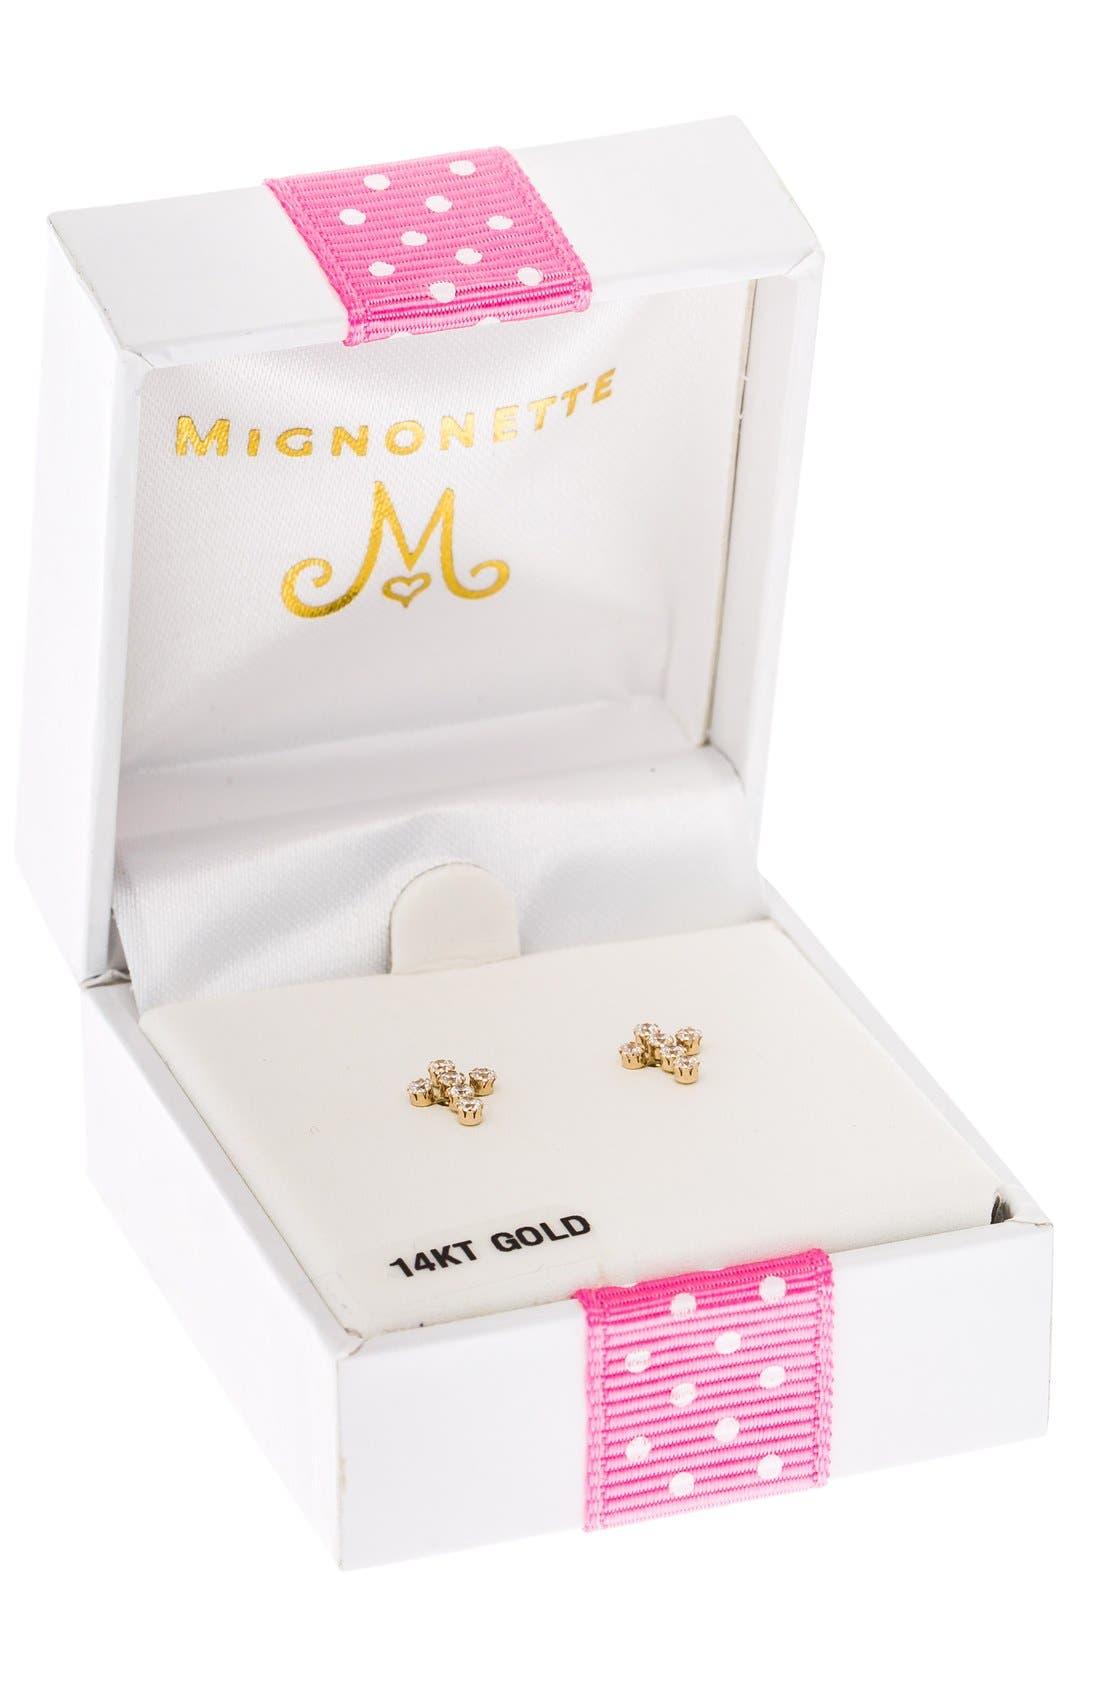 14k Gold & Cubic Zirconia Cross Earrings,                             Alternate thumbnail 3, color,                             GOLD